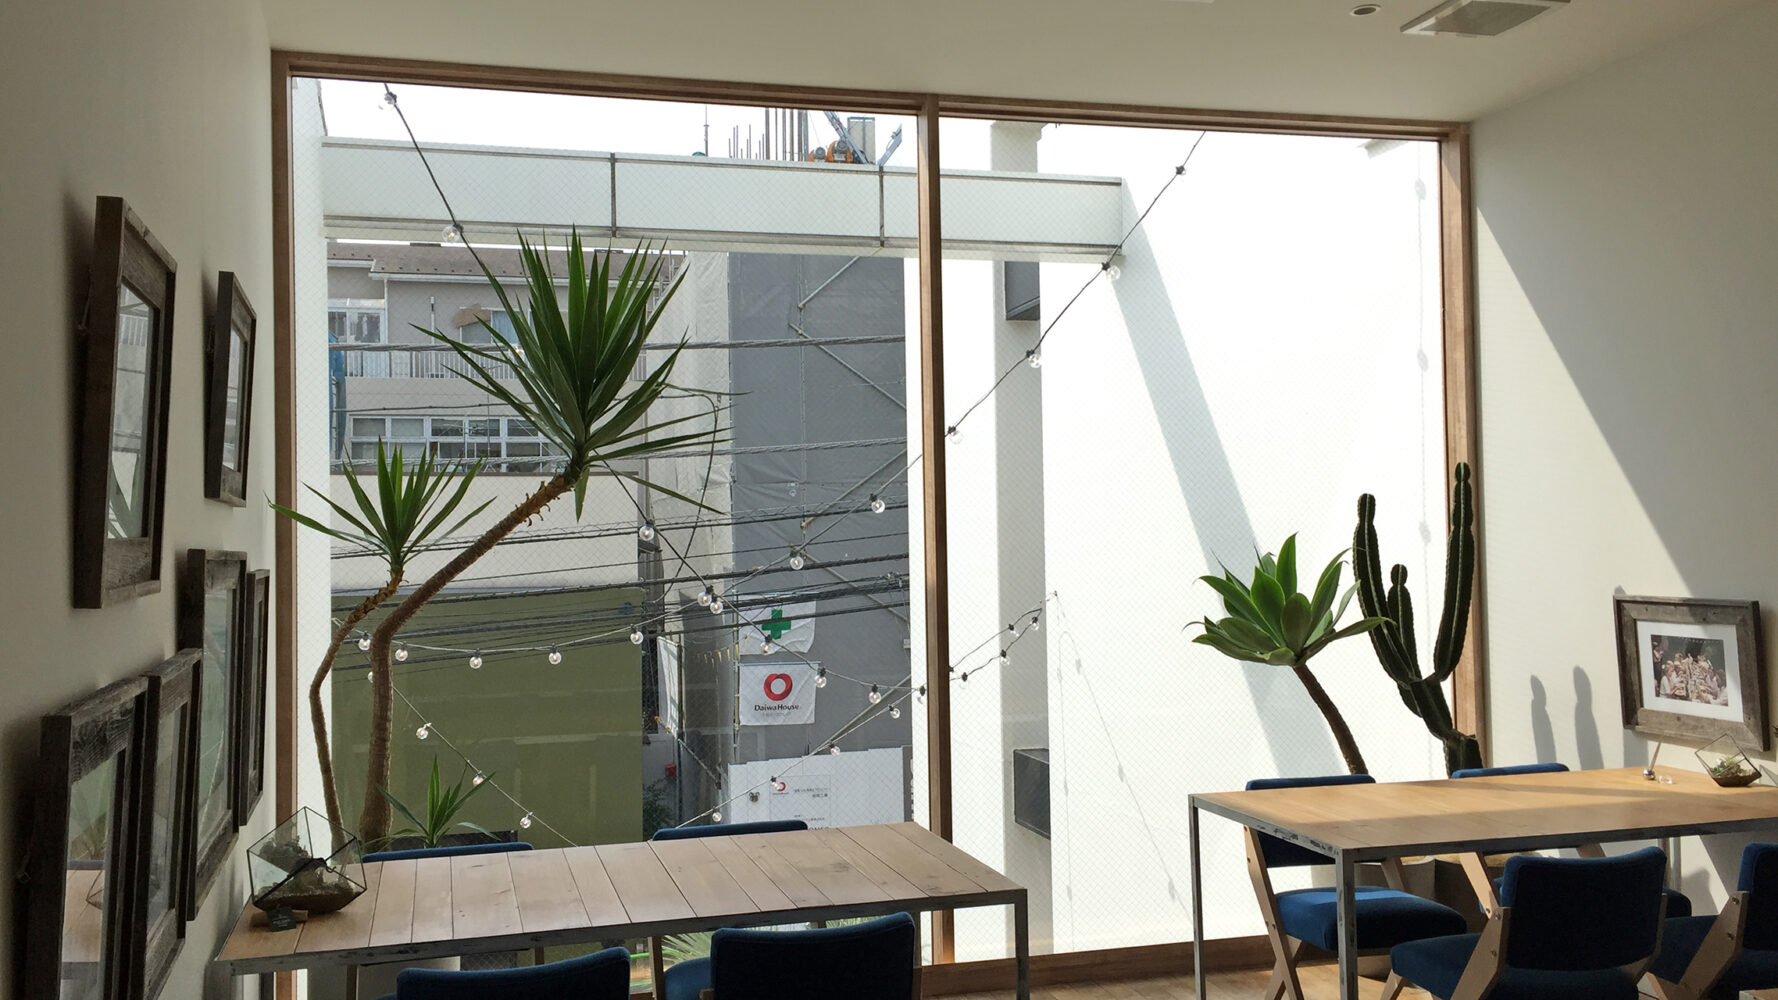 THINGS Aoyama Organic Garden.dth 事例画像3